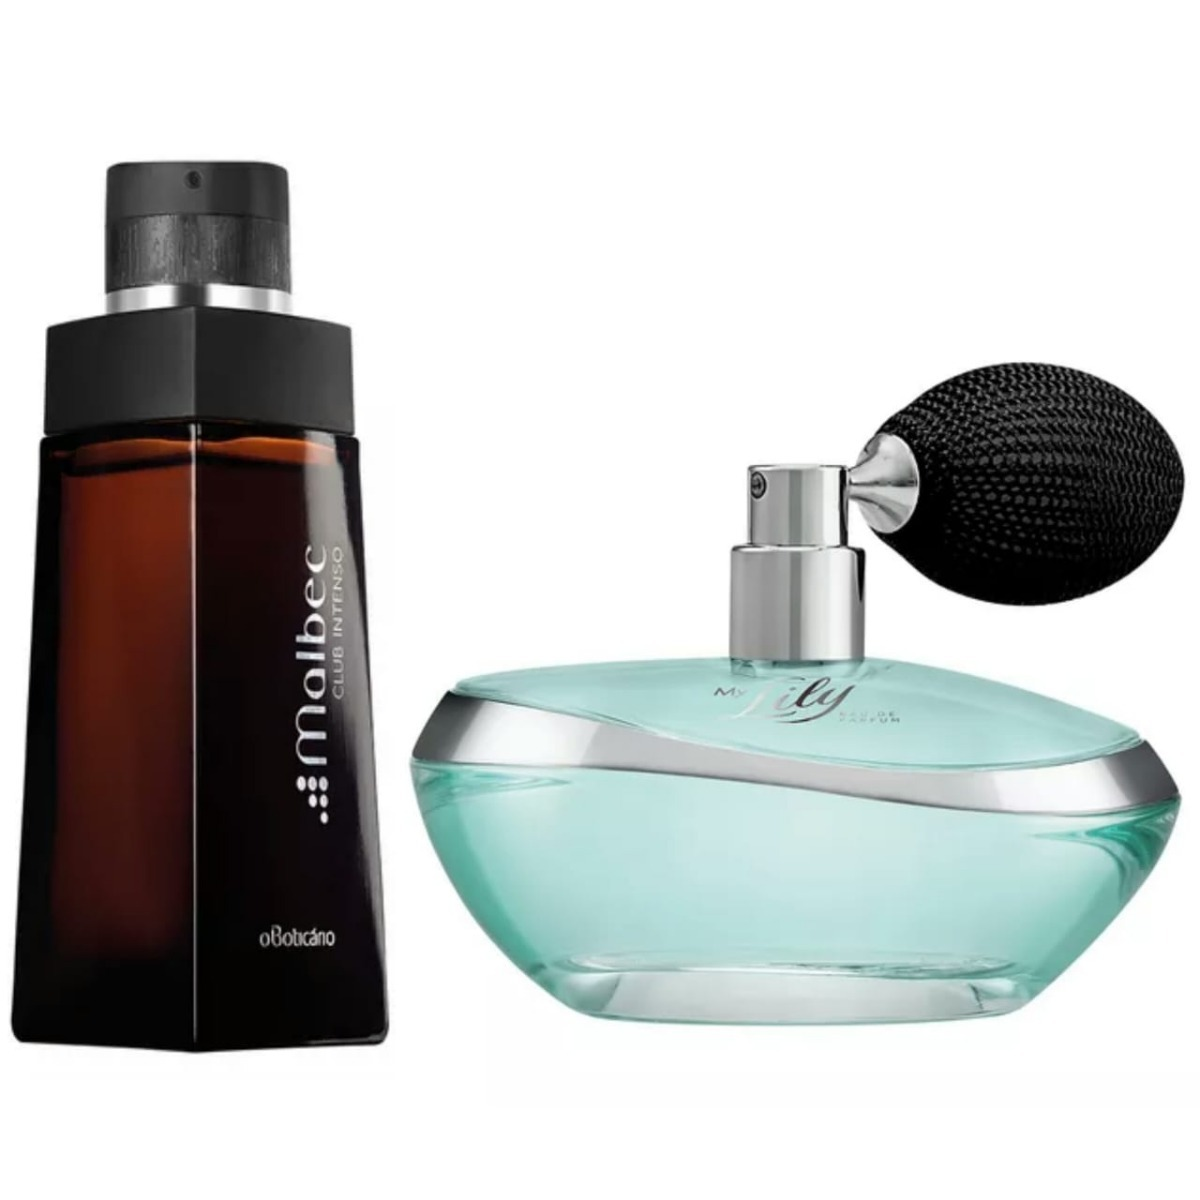 Combo Malbec Club Intenso + My Lily Eau De Parfum, 75ml - R  299,90 ... 826b18082a6e